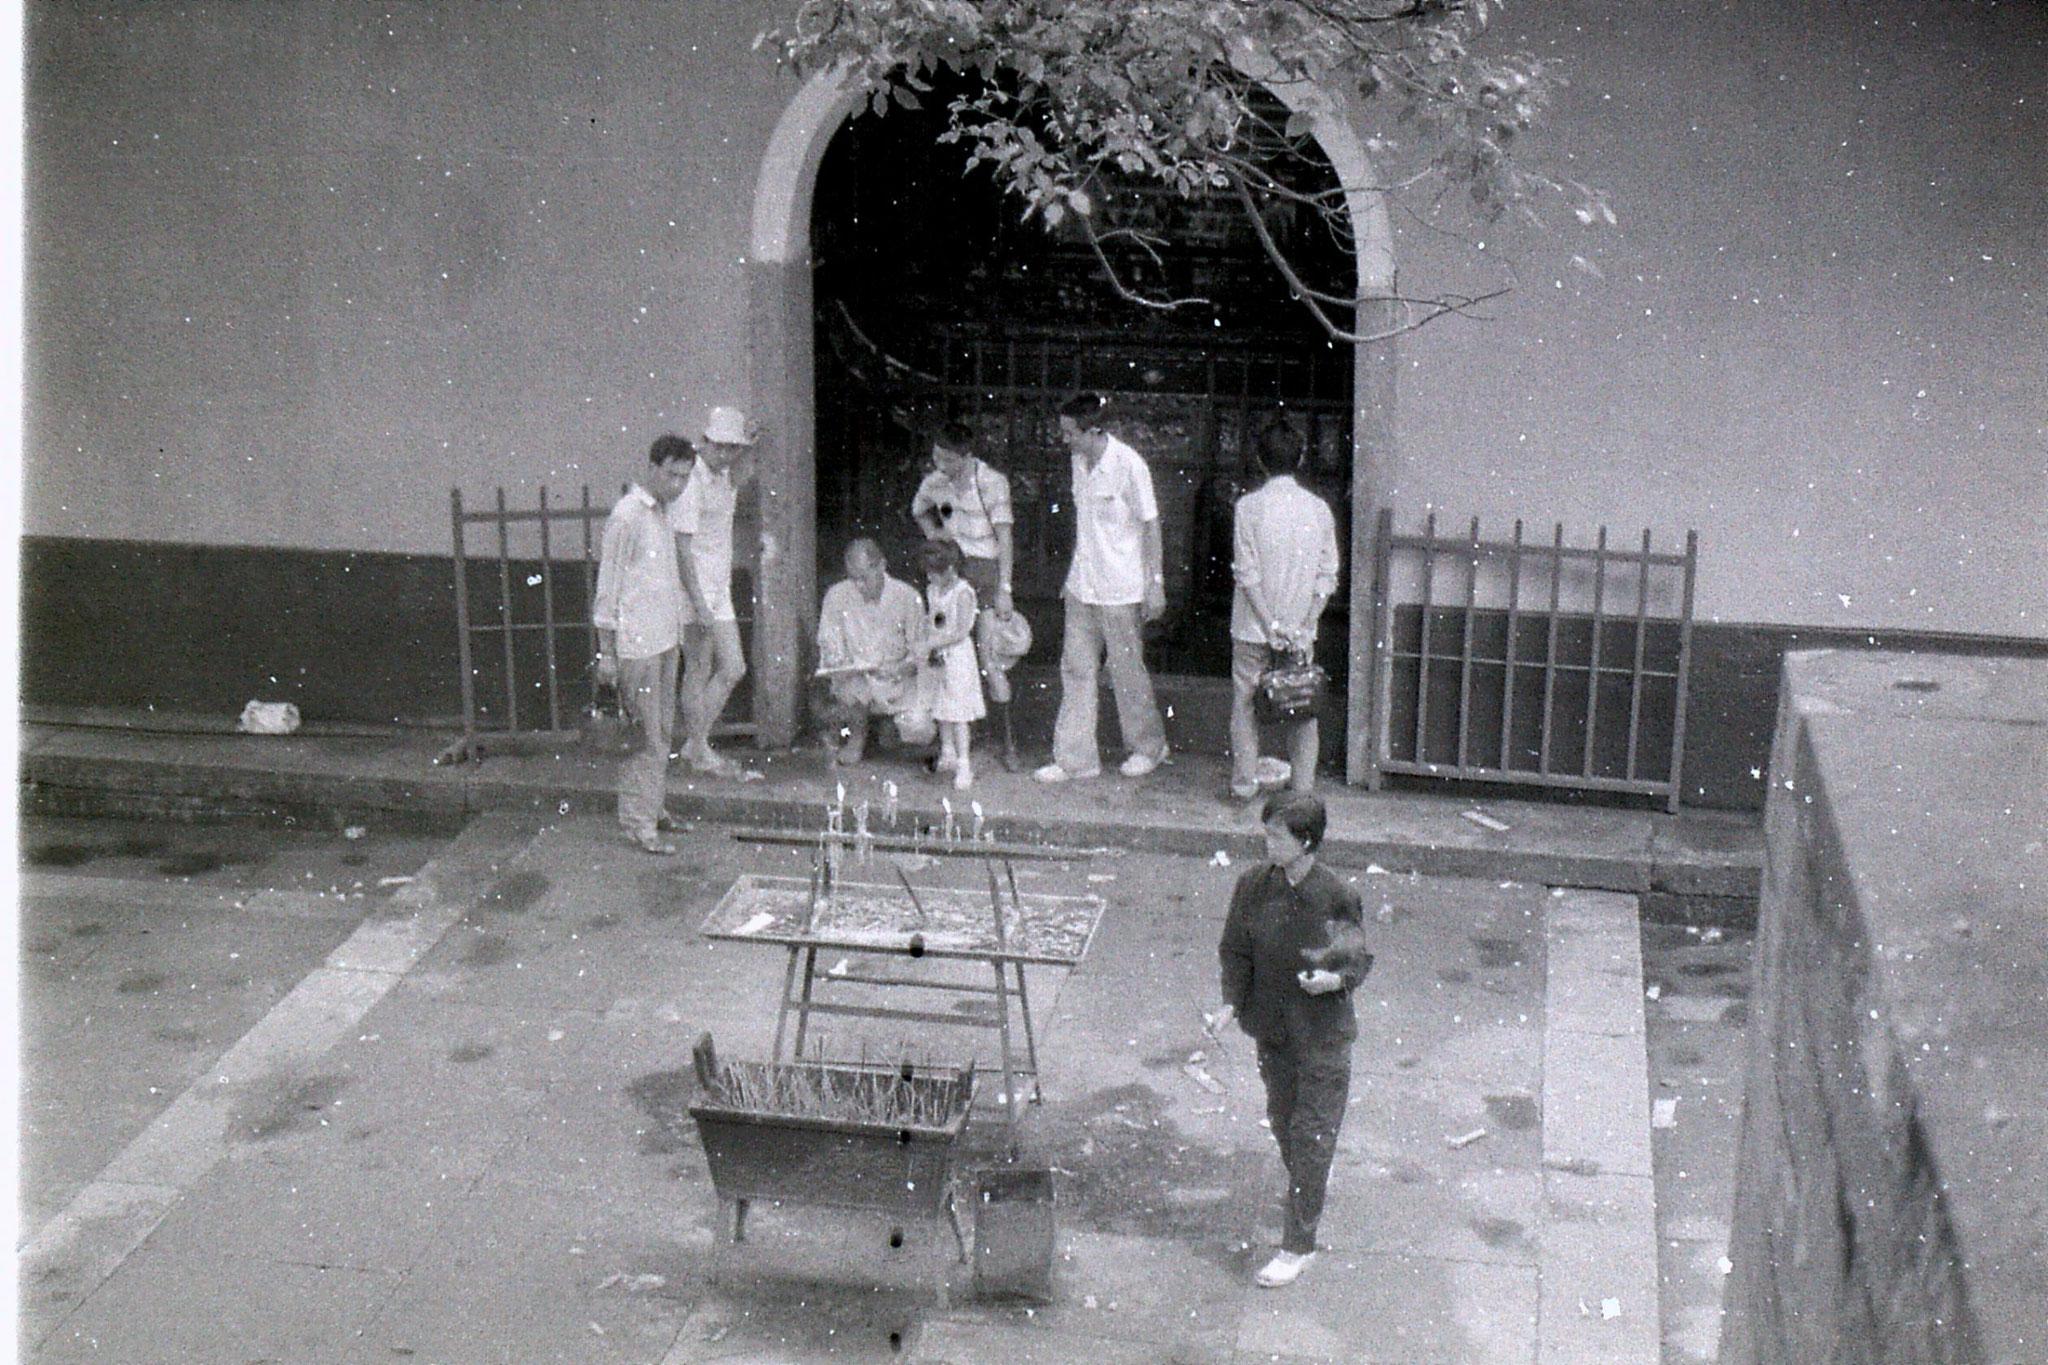 24/7/1989: 8: Putuo Huiji Si